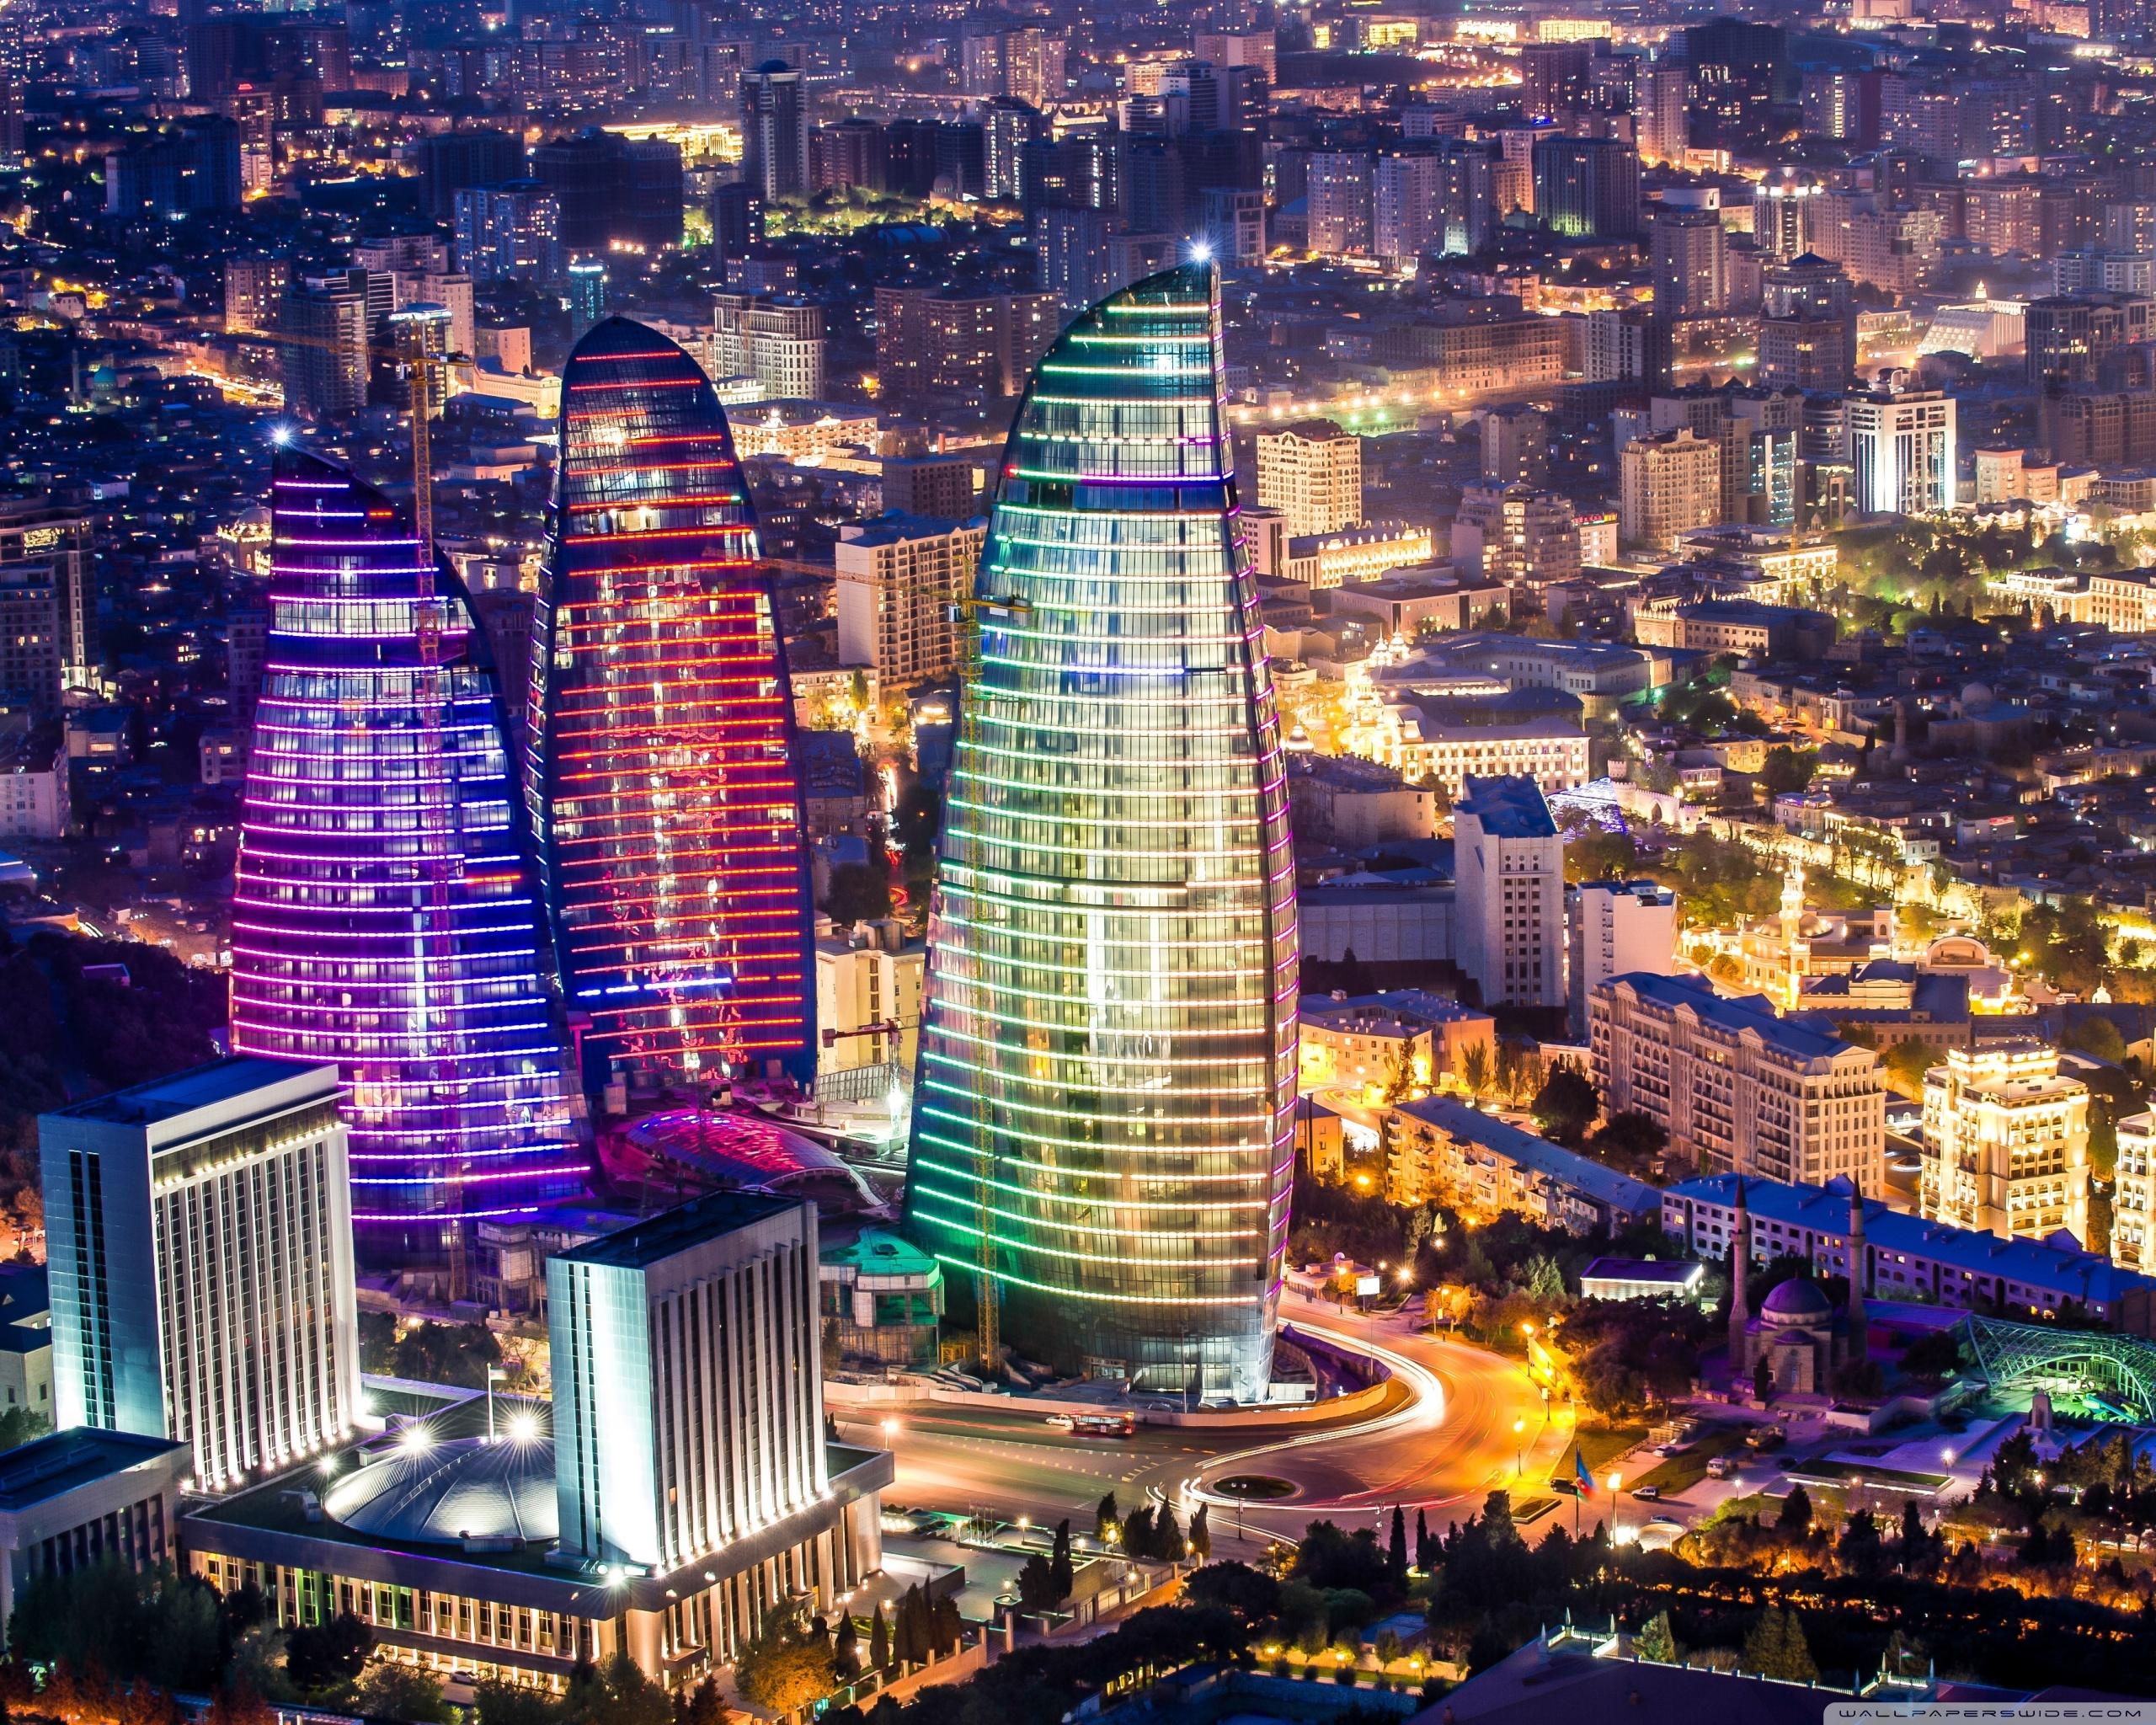 Flame Towers Baku Azerbaijan 4K HD Desktop Wallpaper for 2560x2048